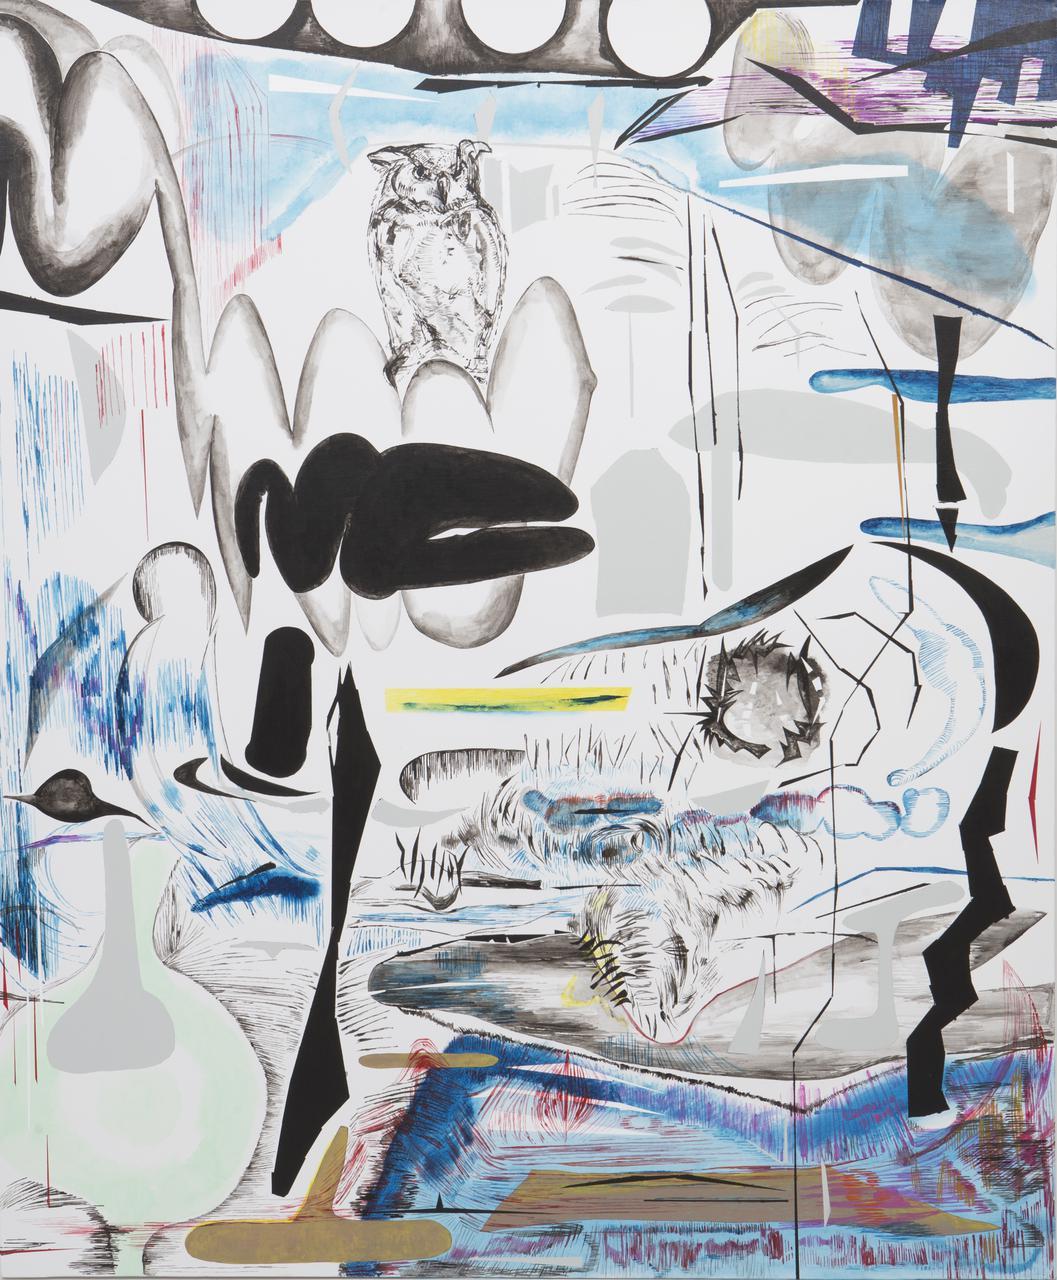 Vana Fertaki, Glaux, oil and varnish on canvas, 120 x 100 cm, 2017